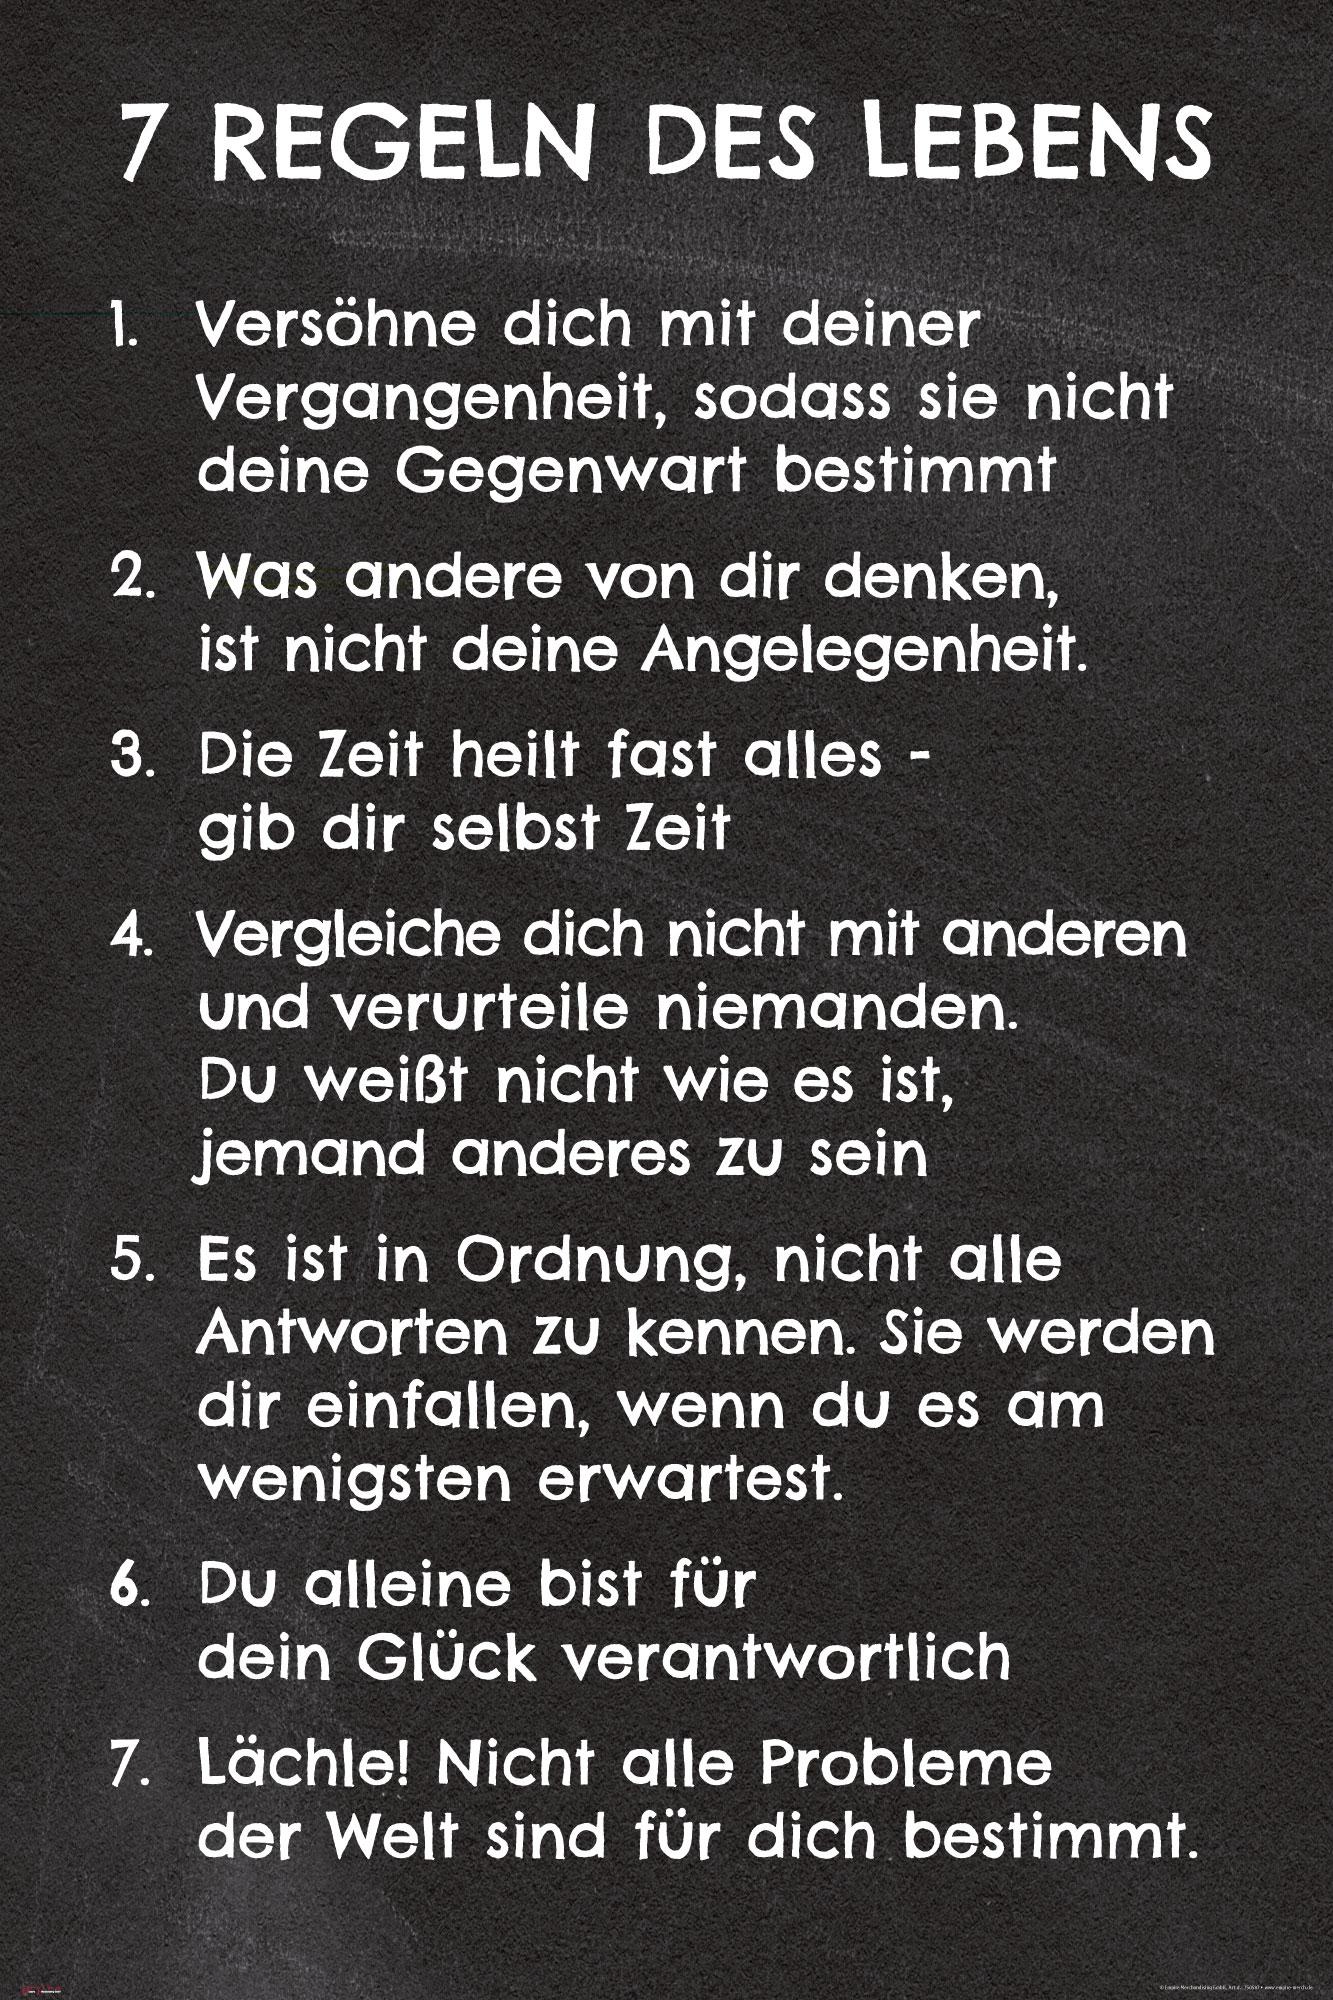 Regeln Des Lebens